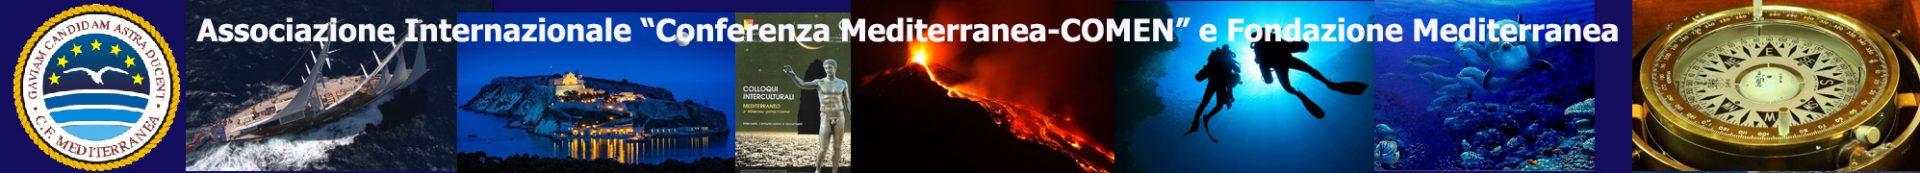 Comen – Conferenza Mediterranea